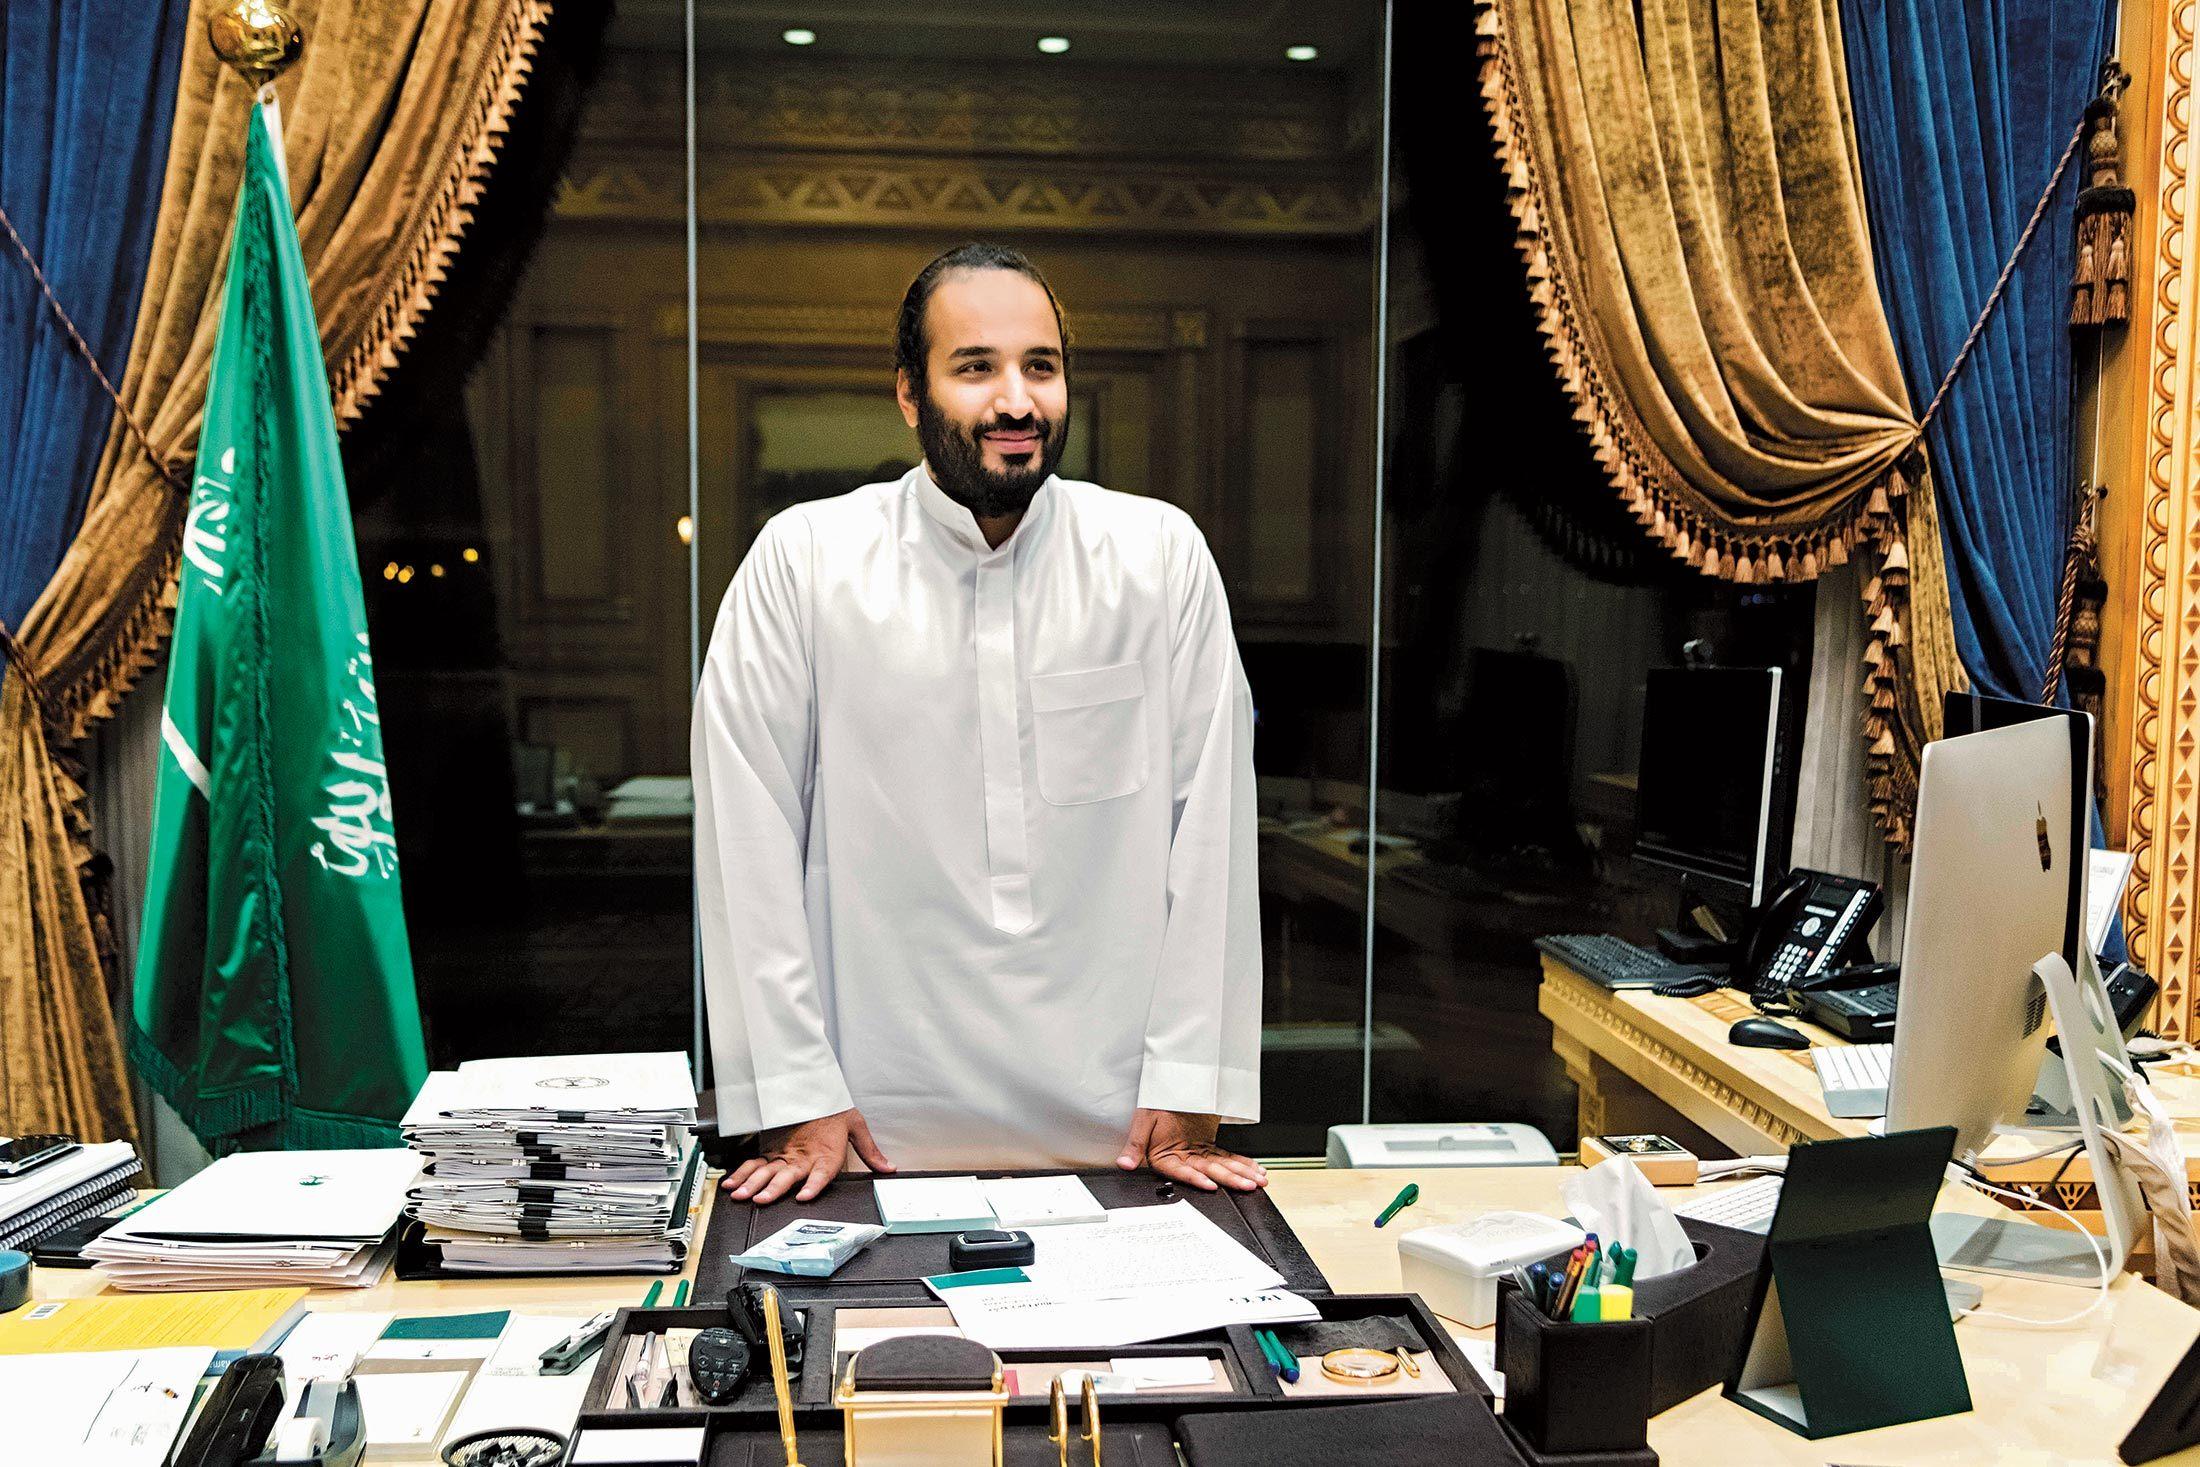 Mohamed bin Salmán, el rey del desierto